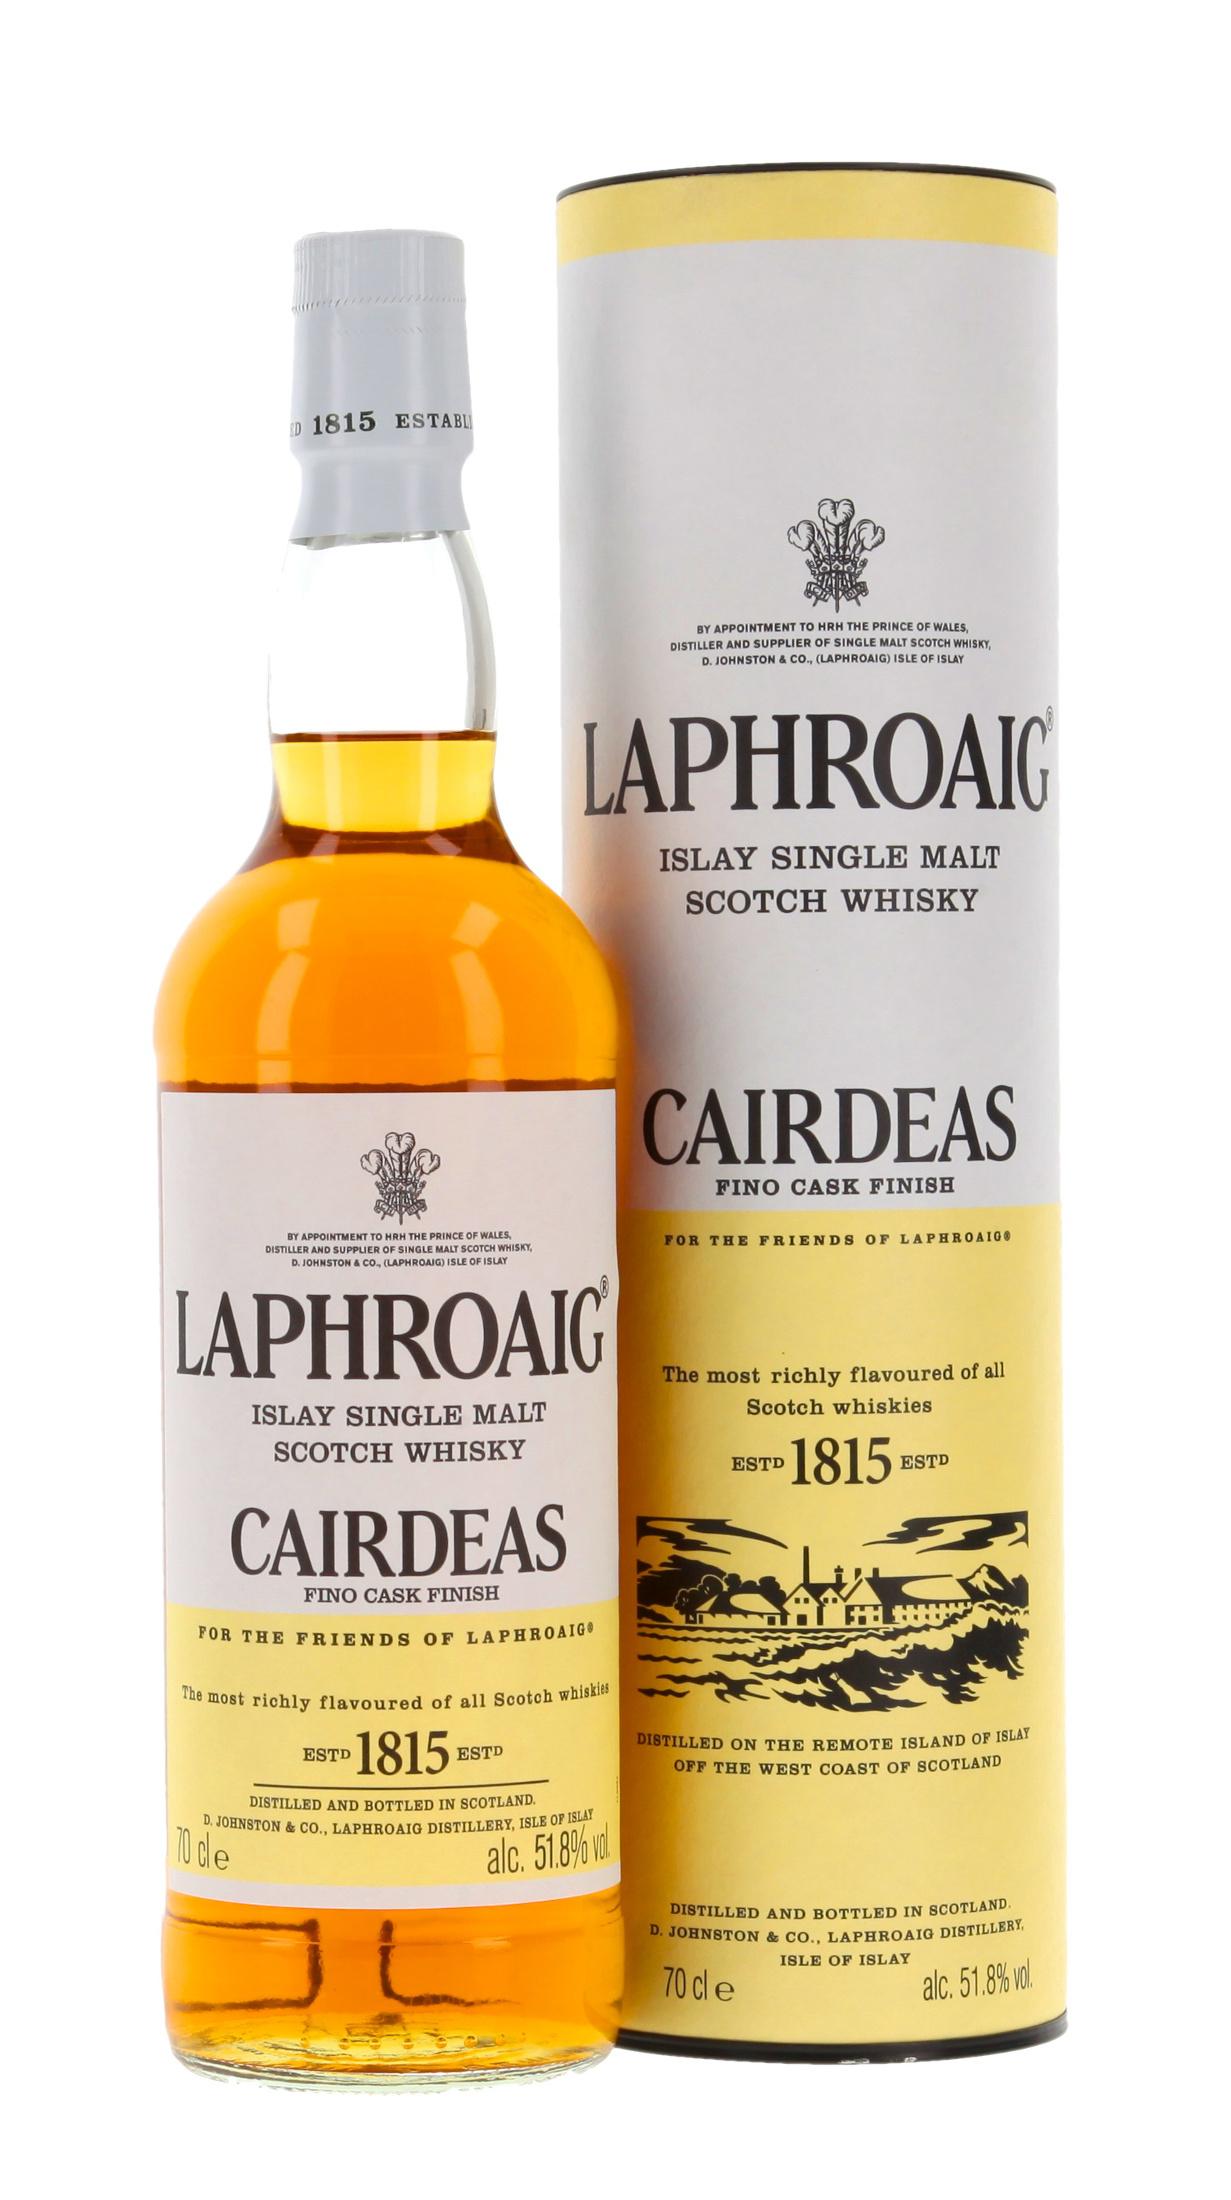 Laphroaig Cairdeas 2018 Islay Single Malt Scotch Whisky Fino Sherry Cask